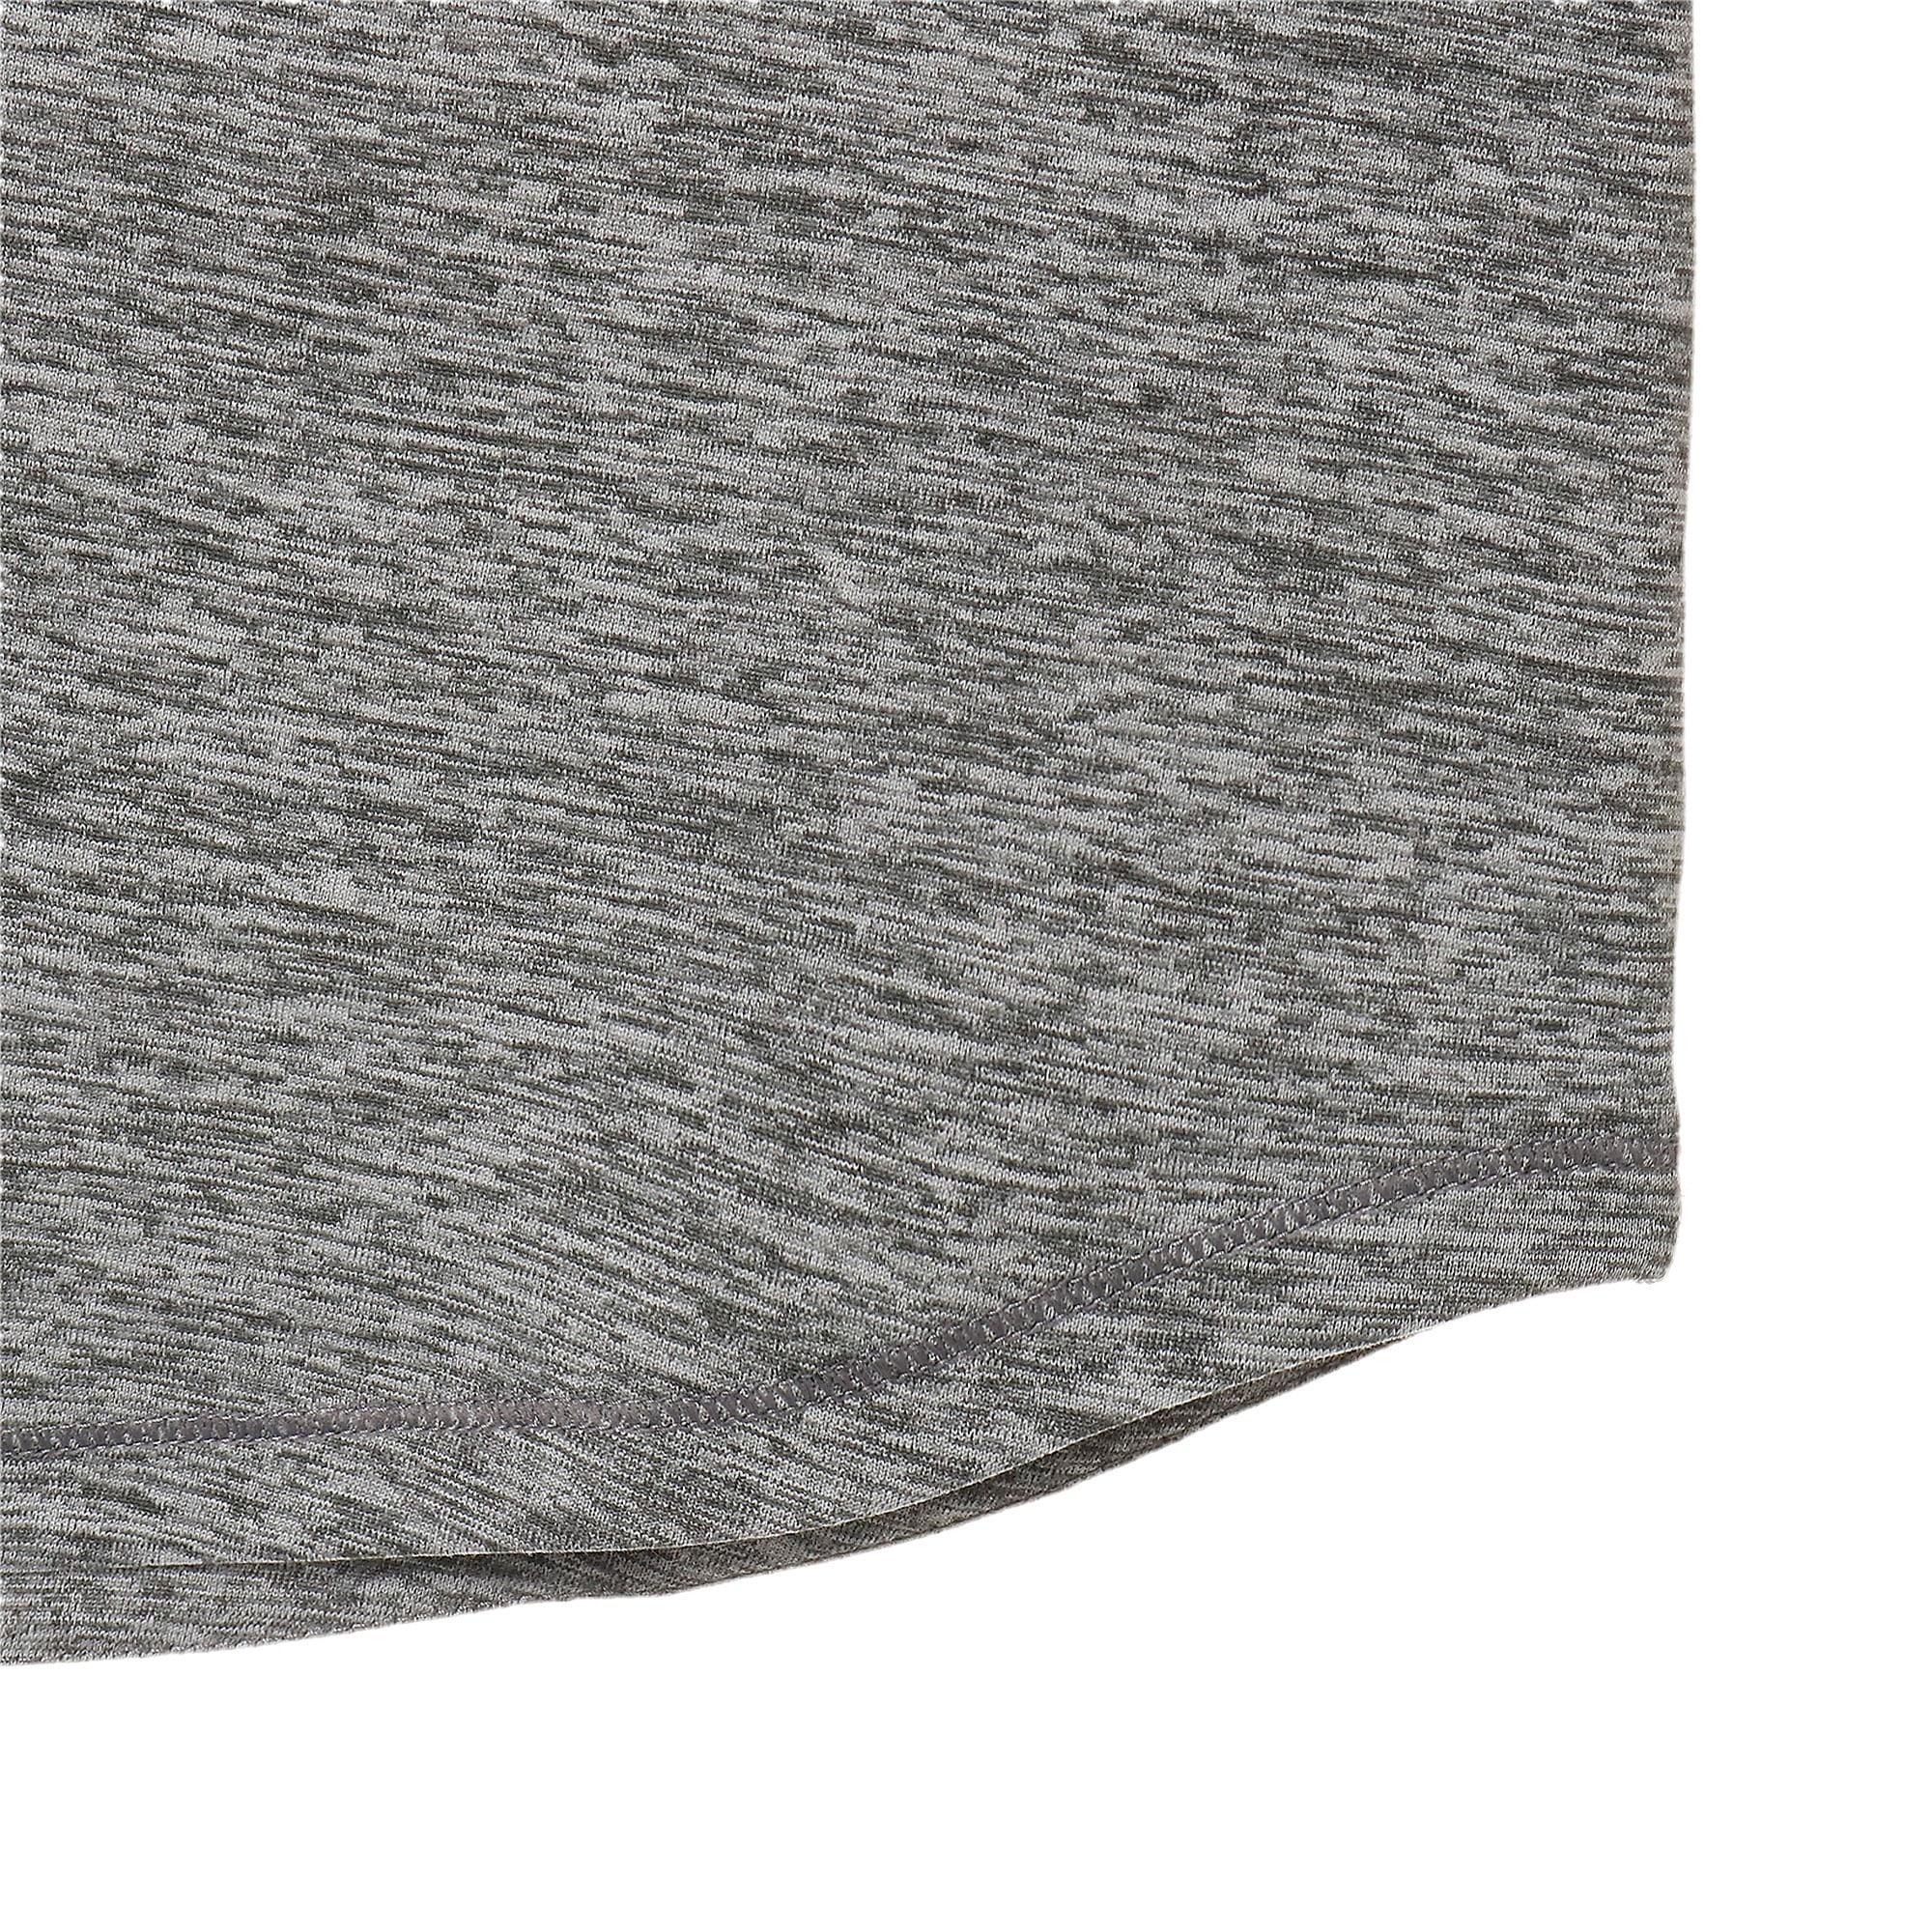 Thumbnail 8 of ヘザー キャット ウィメンズ ランニング Tシャツ 半袖, Medium Gray Heather, medium-JPN